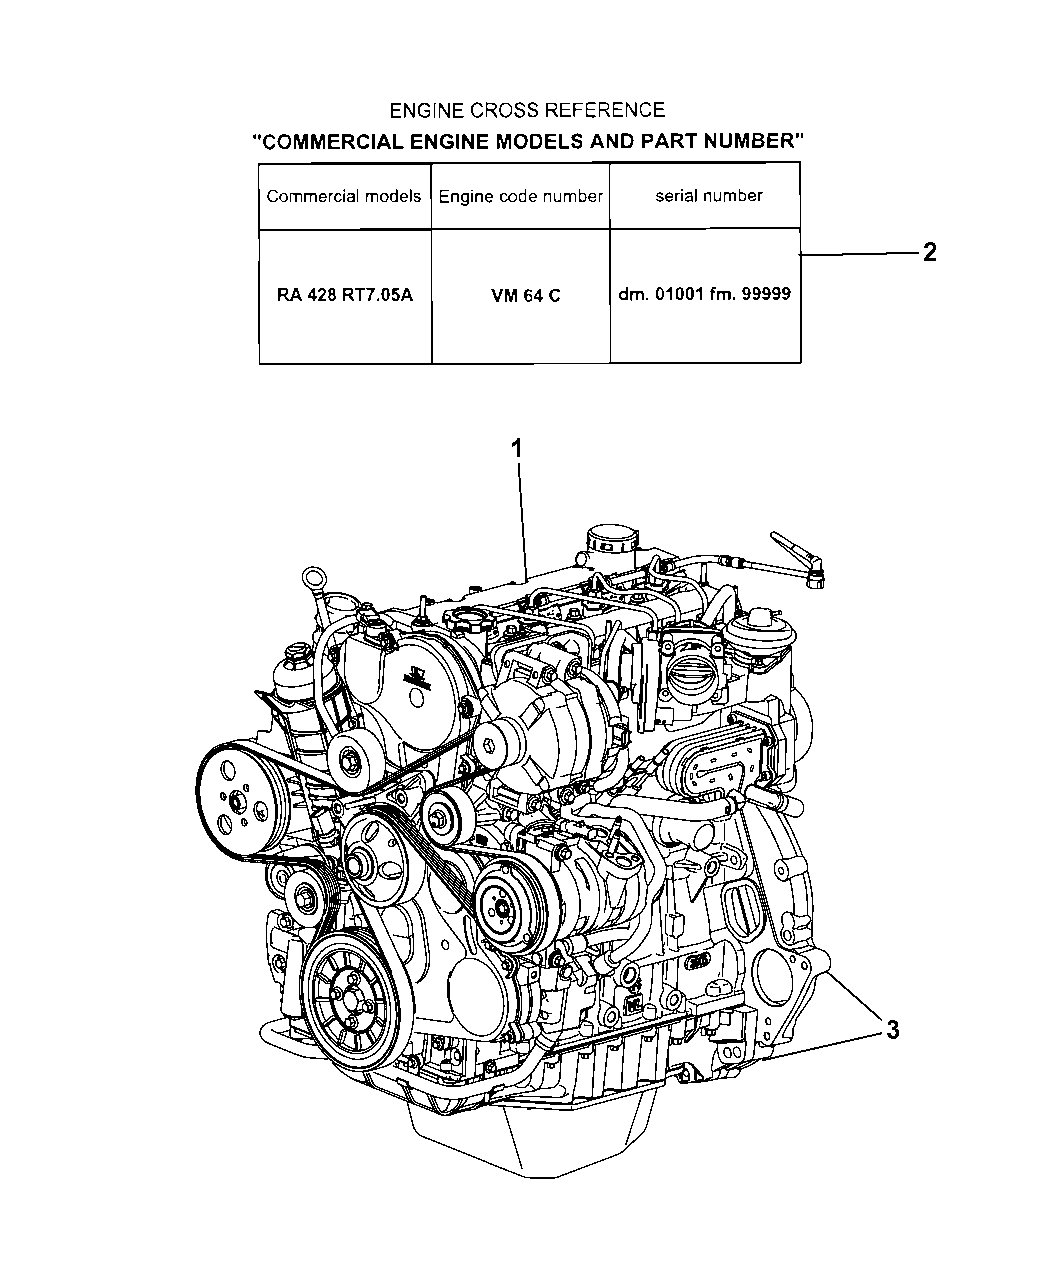 2008 Jeep Liberty Engine Assembly Identification Diagram Thumbnail 2